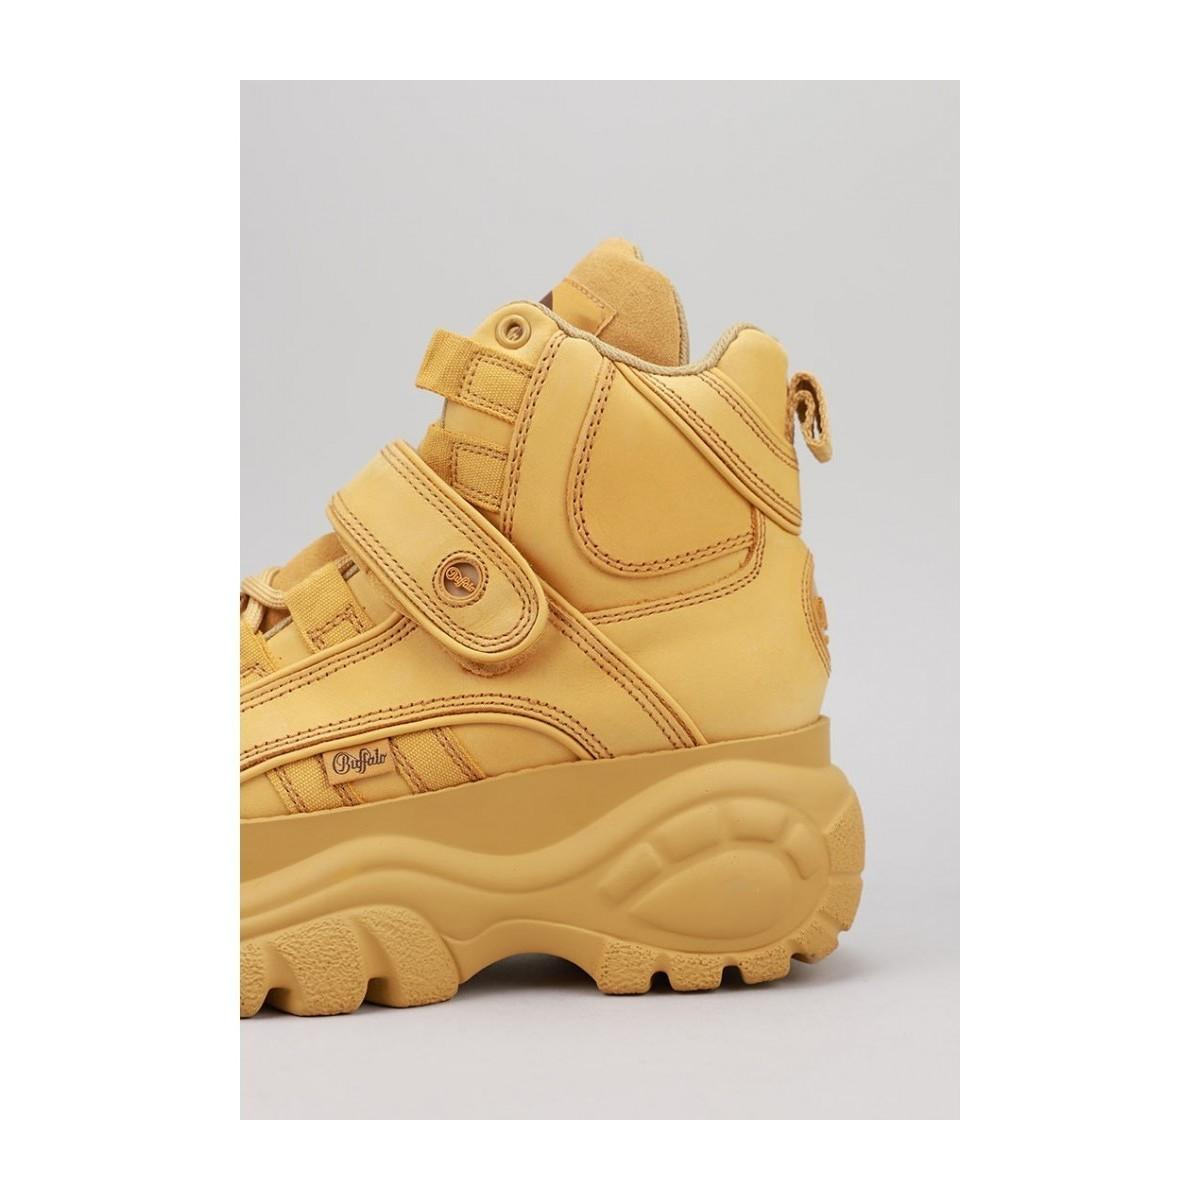 1348-14 2.0 CLASSICS Chaussures Buffalo pour homme